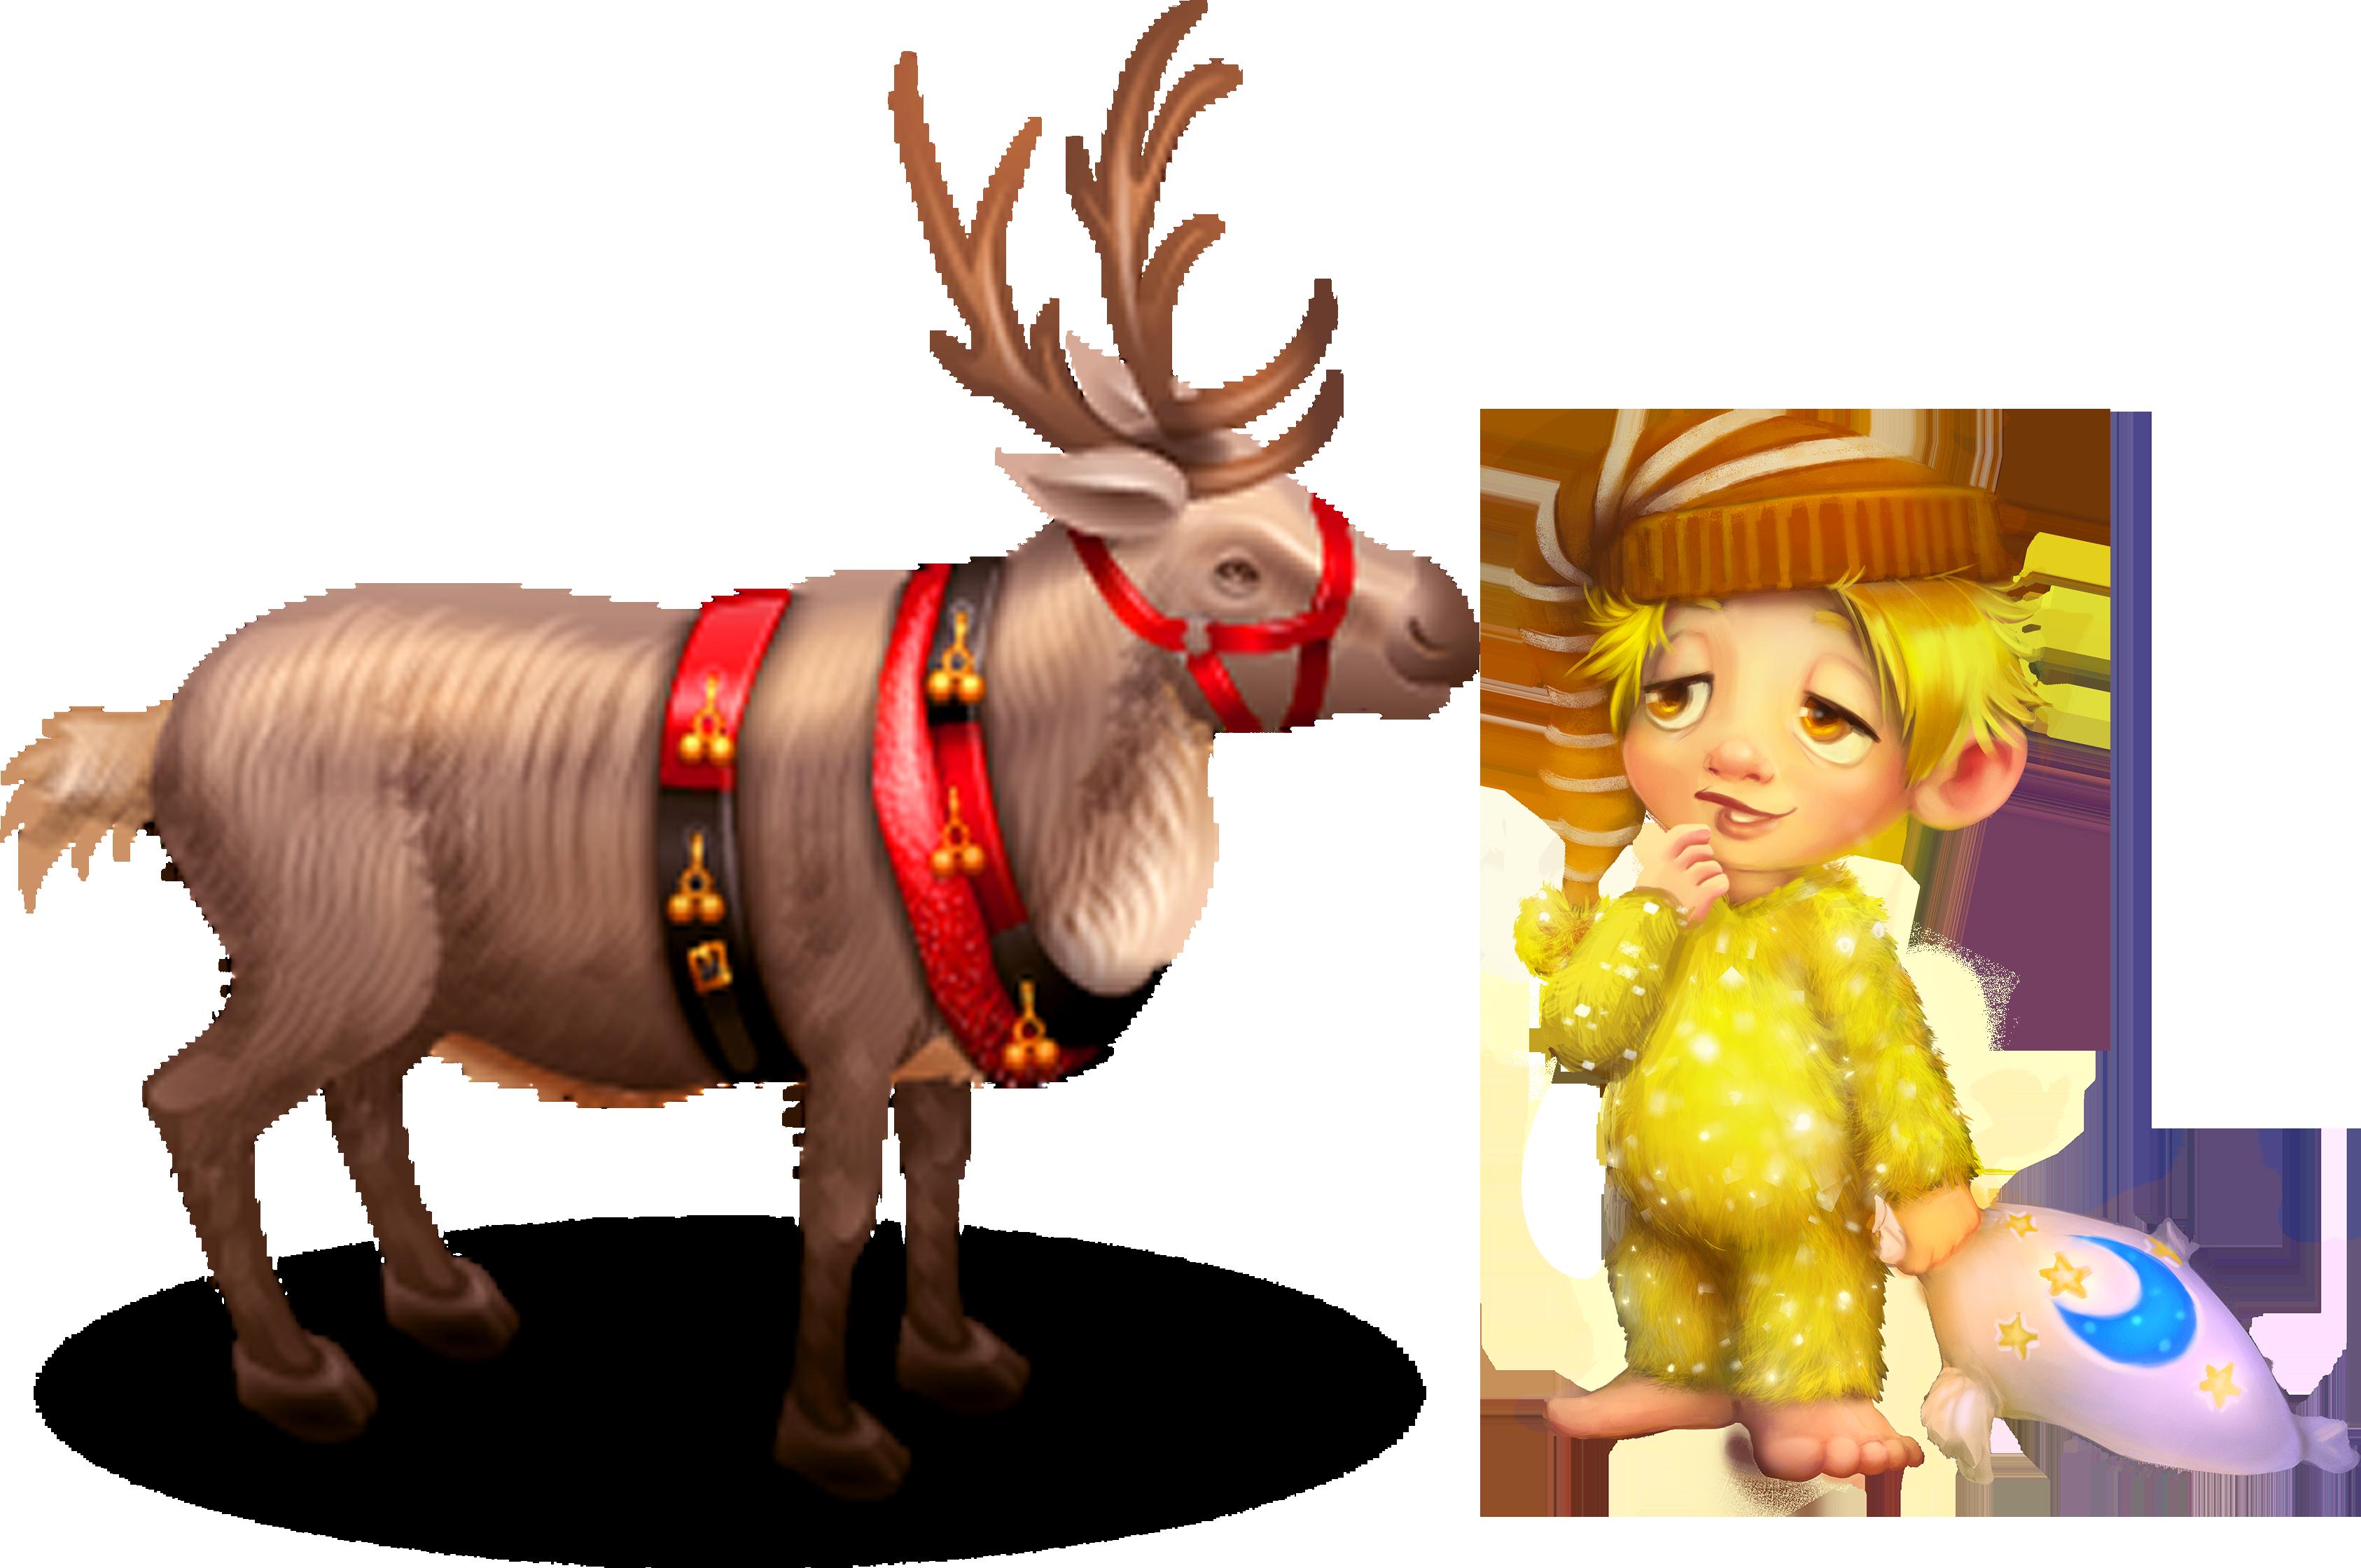 Topaz and Reindeer